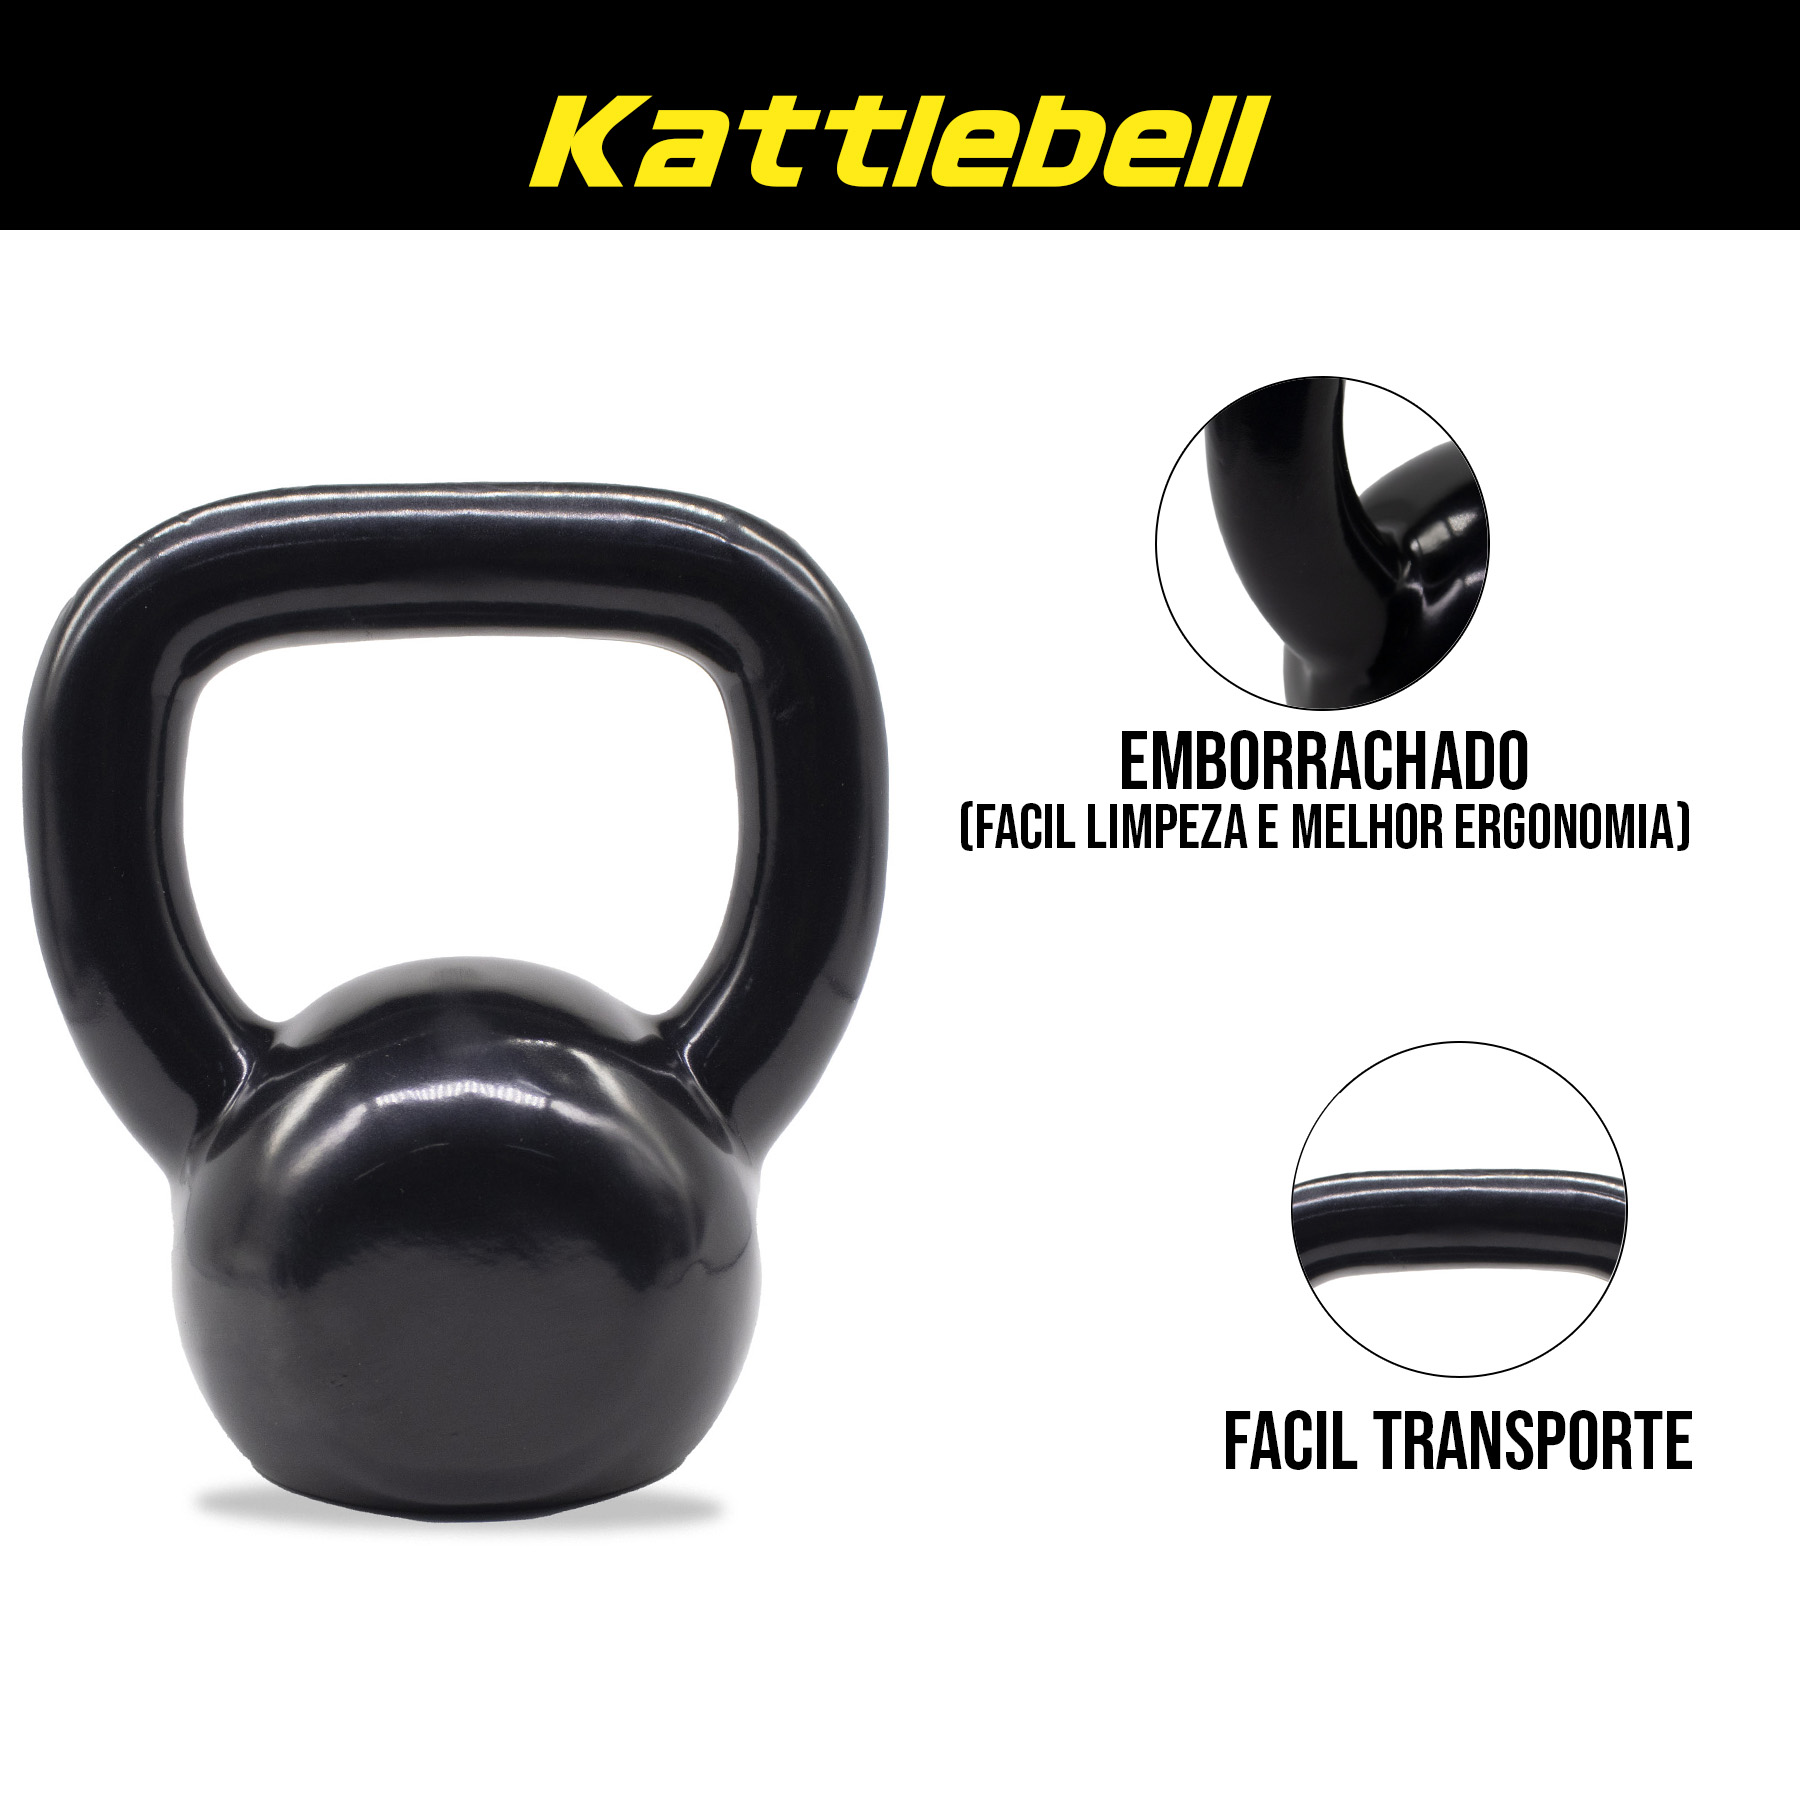 Kettlebell Emborrachado Peso:22KG